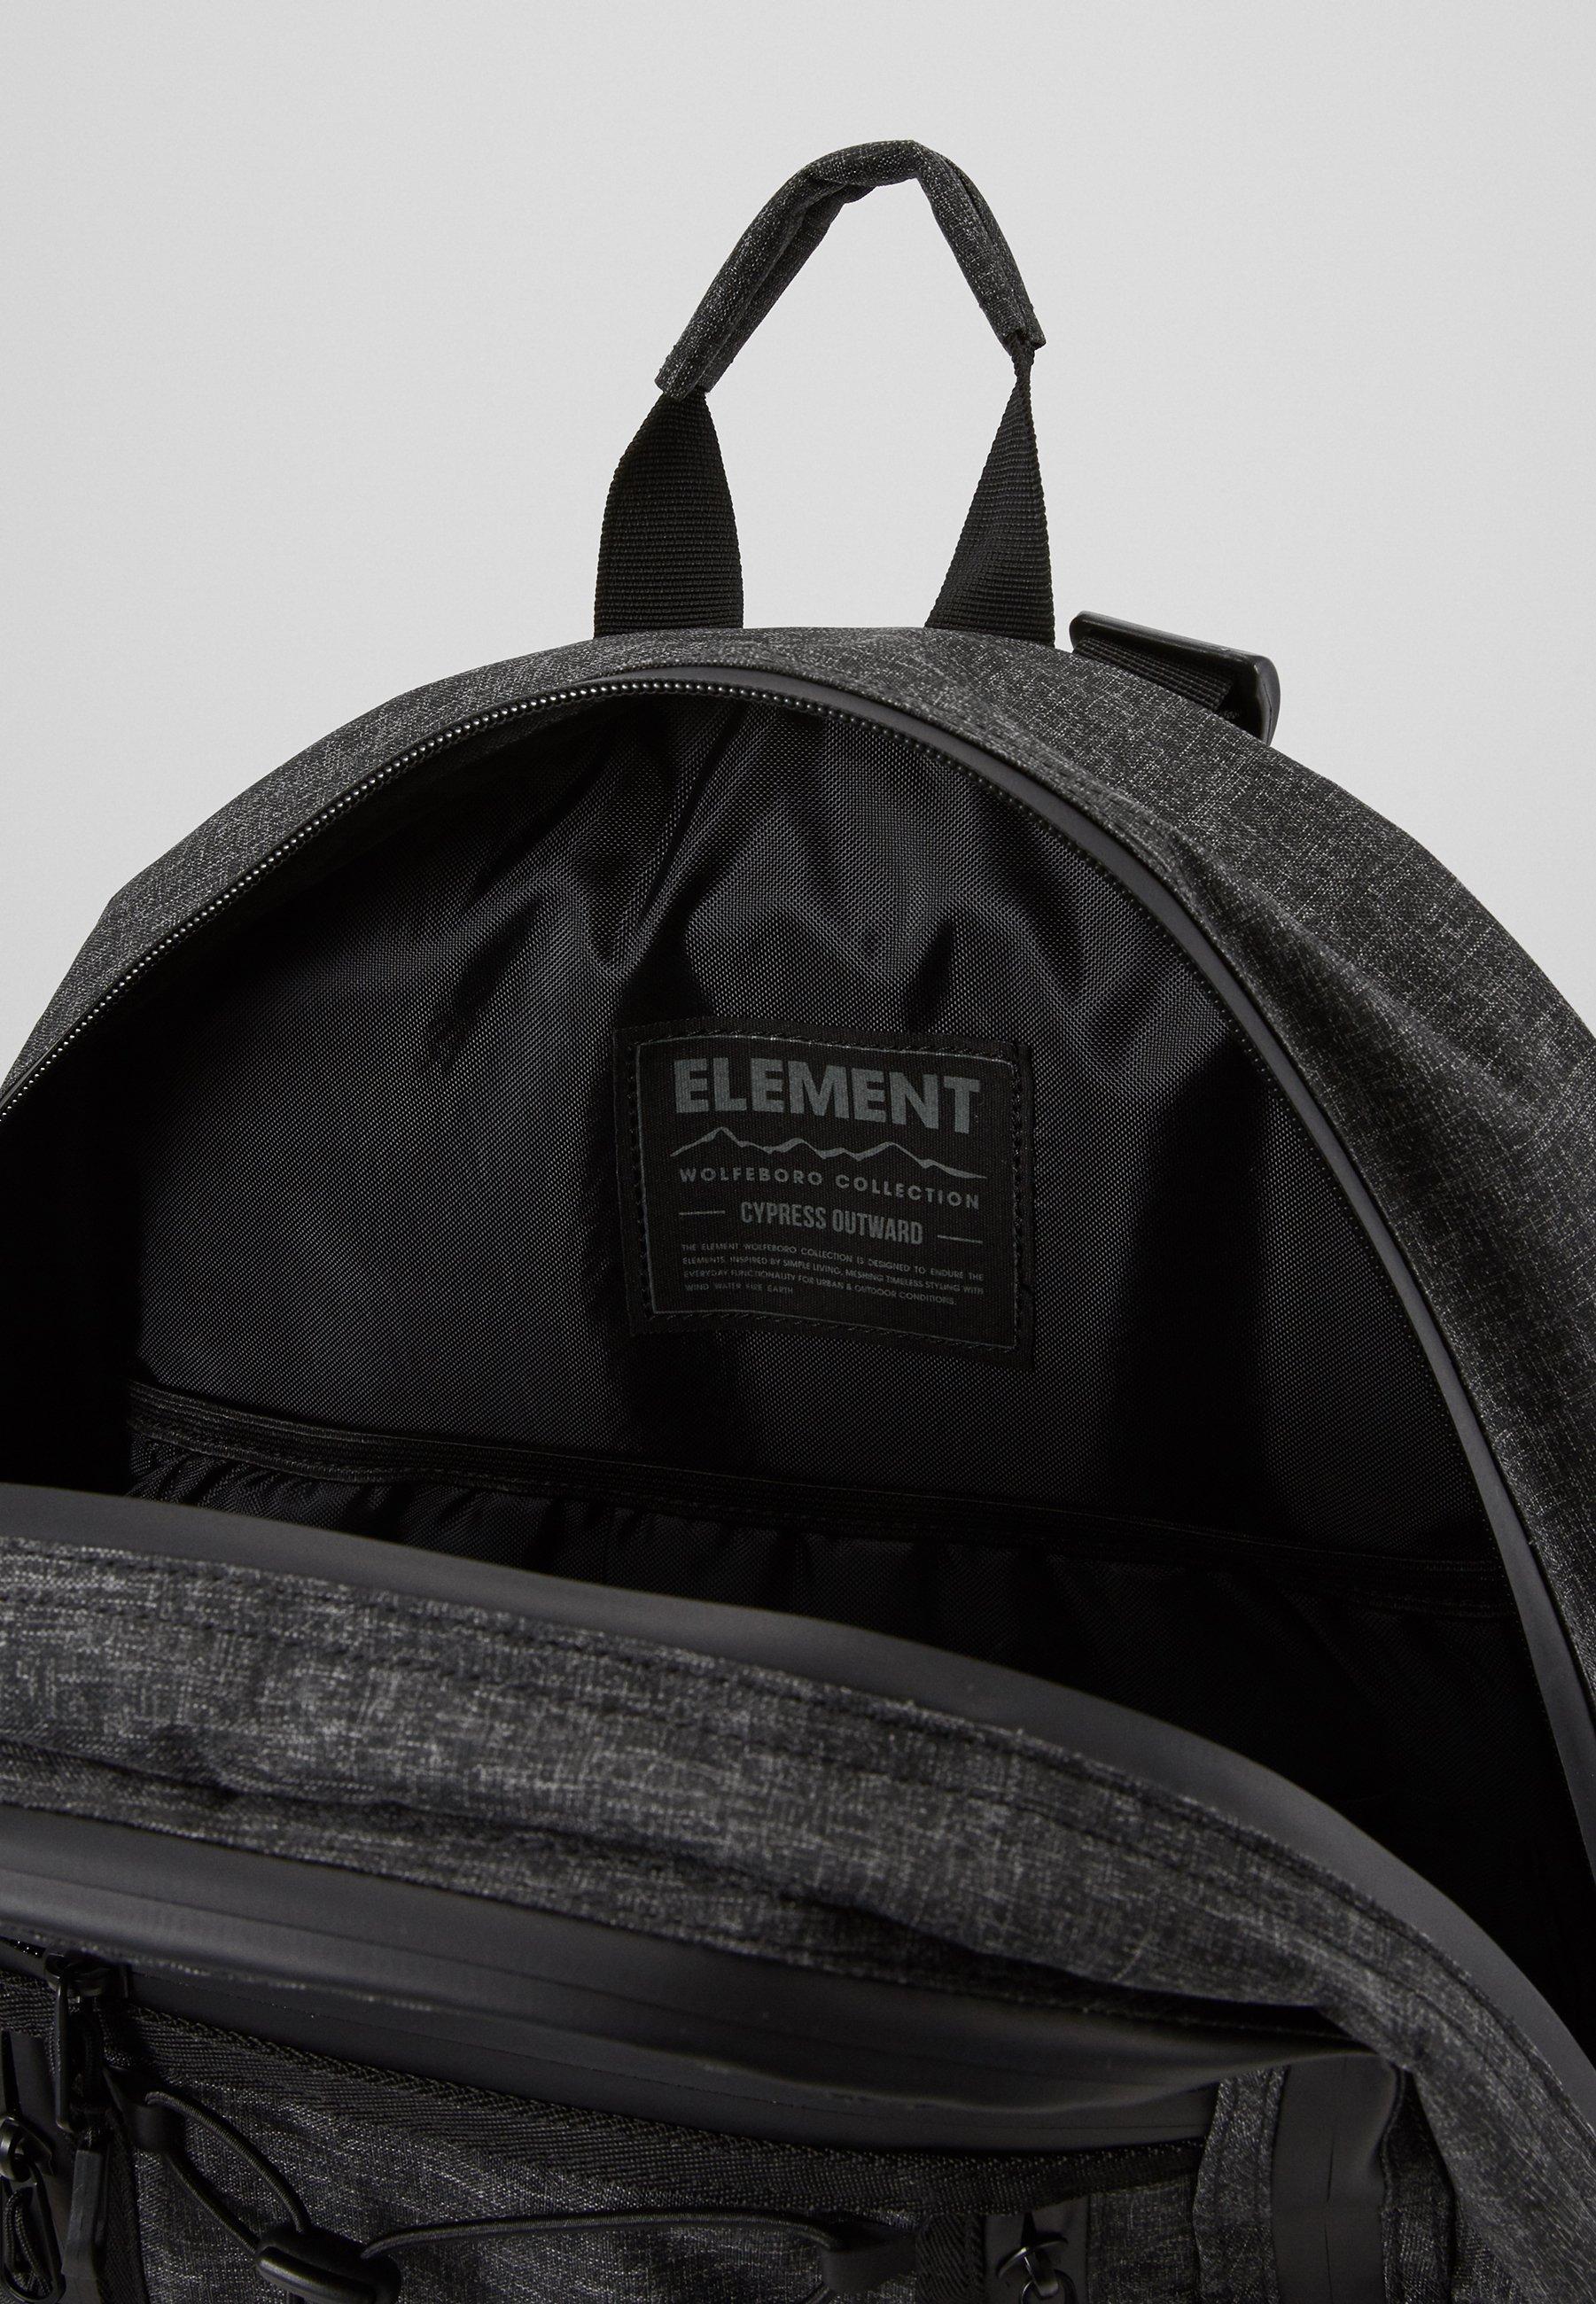 Element Cypress Outward - Tagesrucksack Black Grid/schwarz